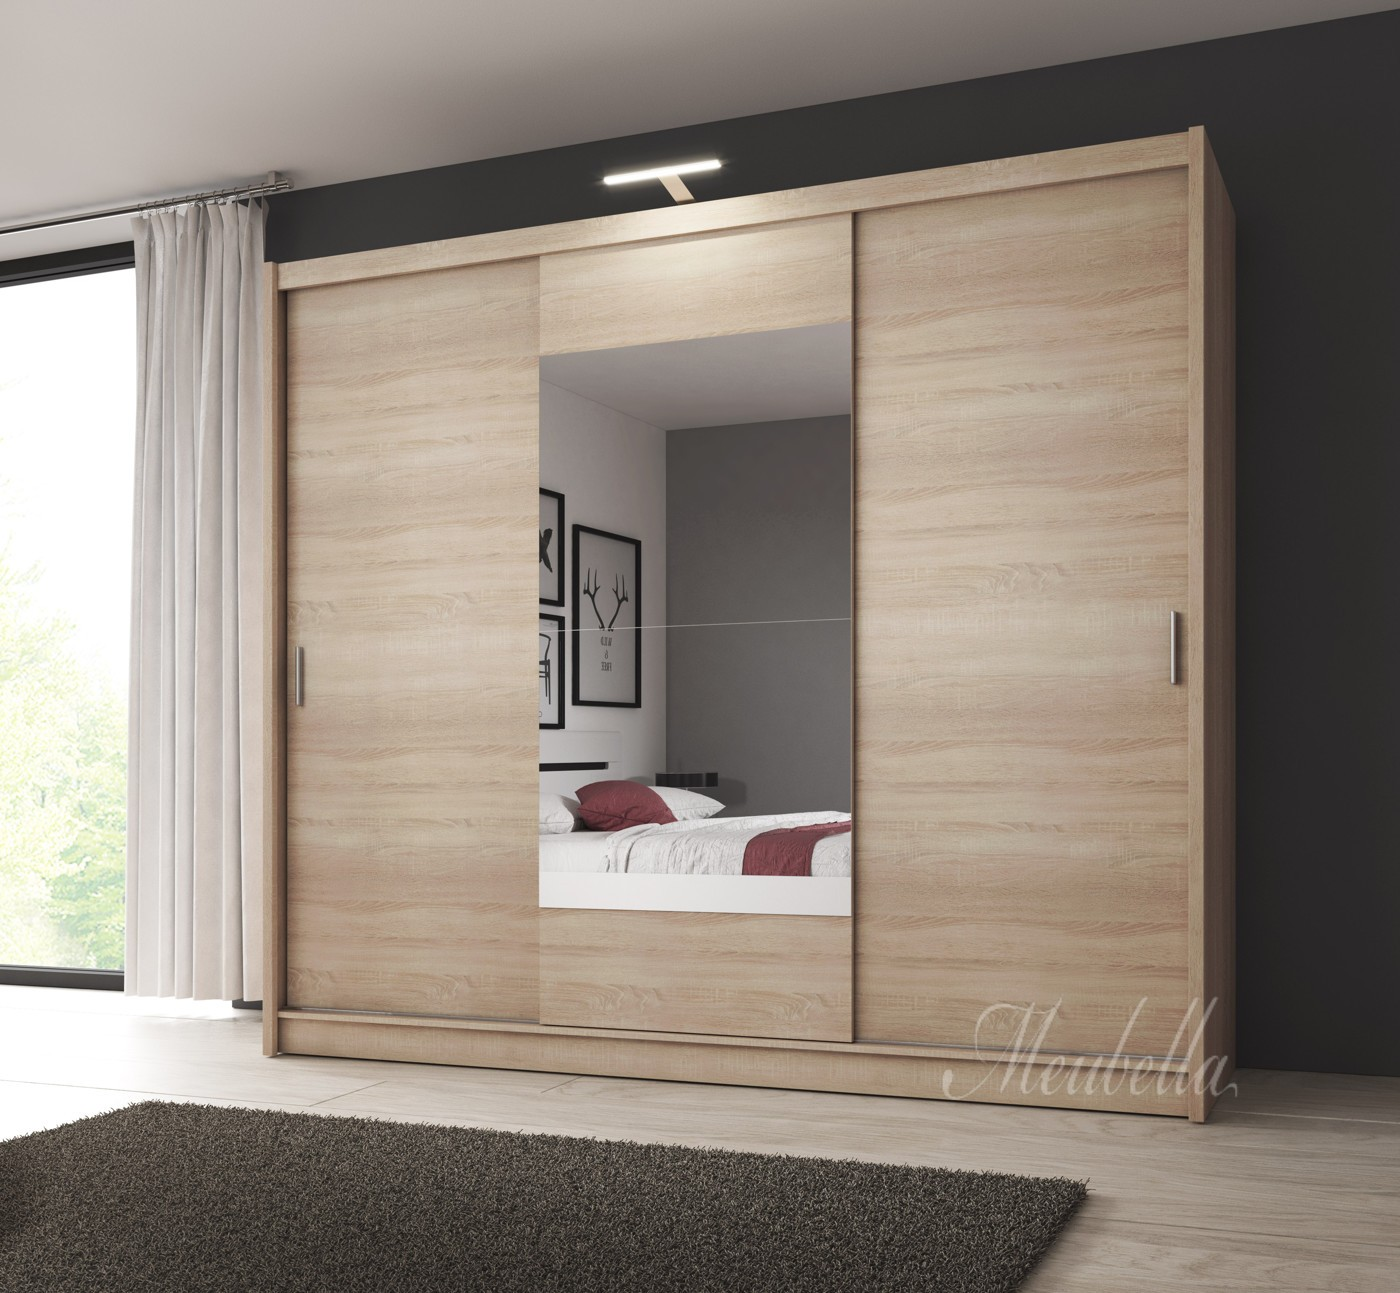 kledingkast houston licht eiken met led verlichting 250 cm meubella. Black Bedroom Furniture Sets. Home Design Ideas